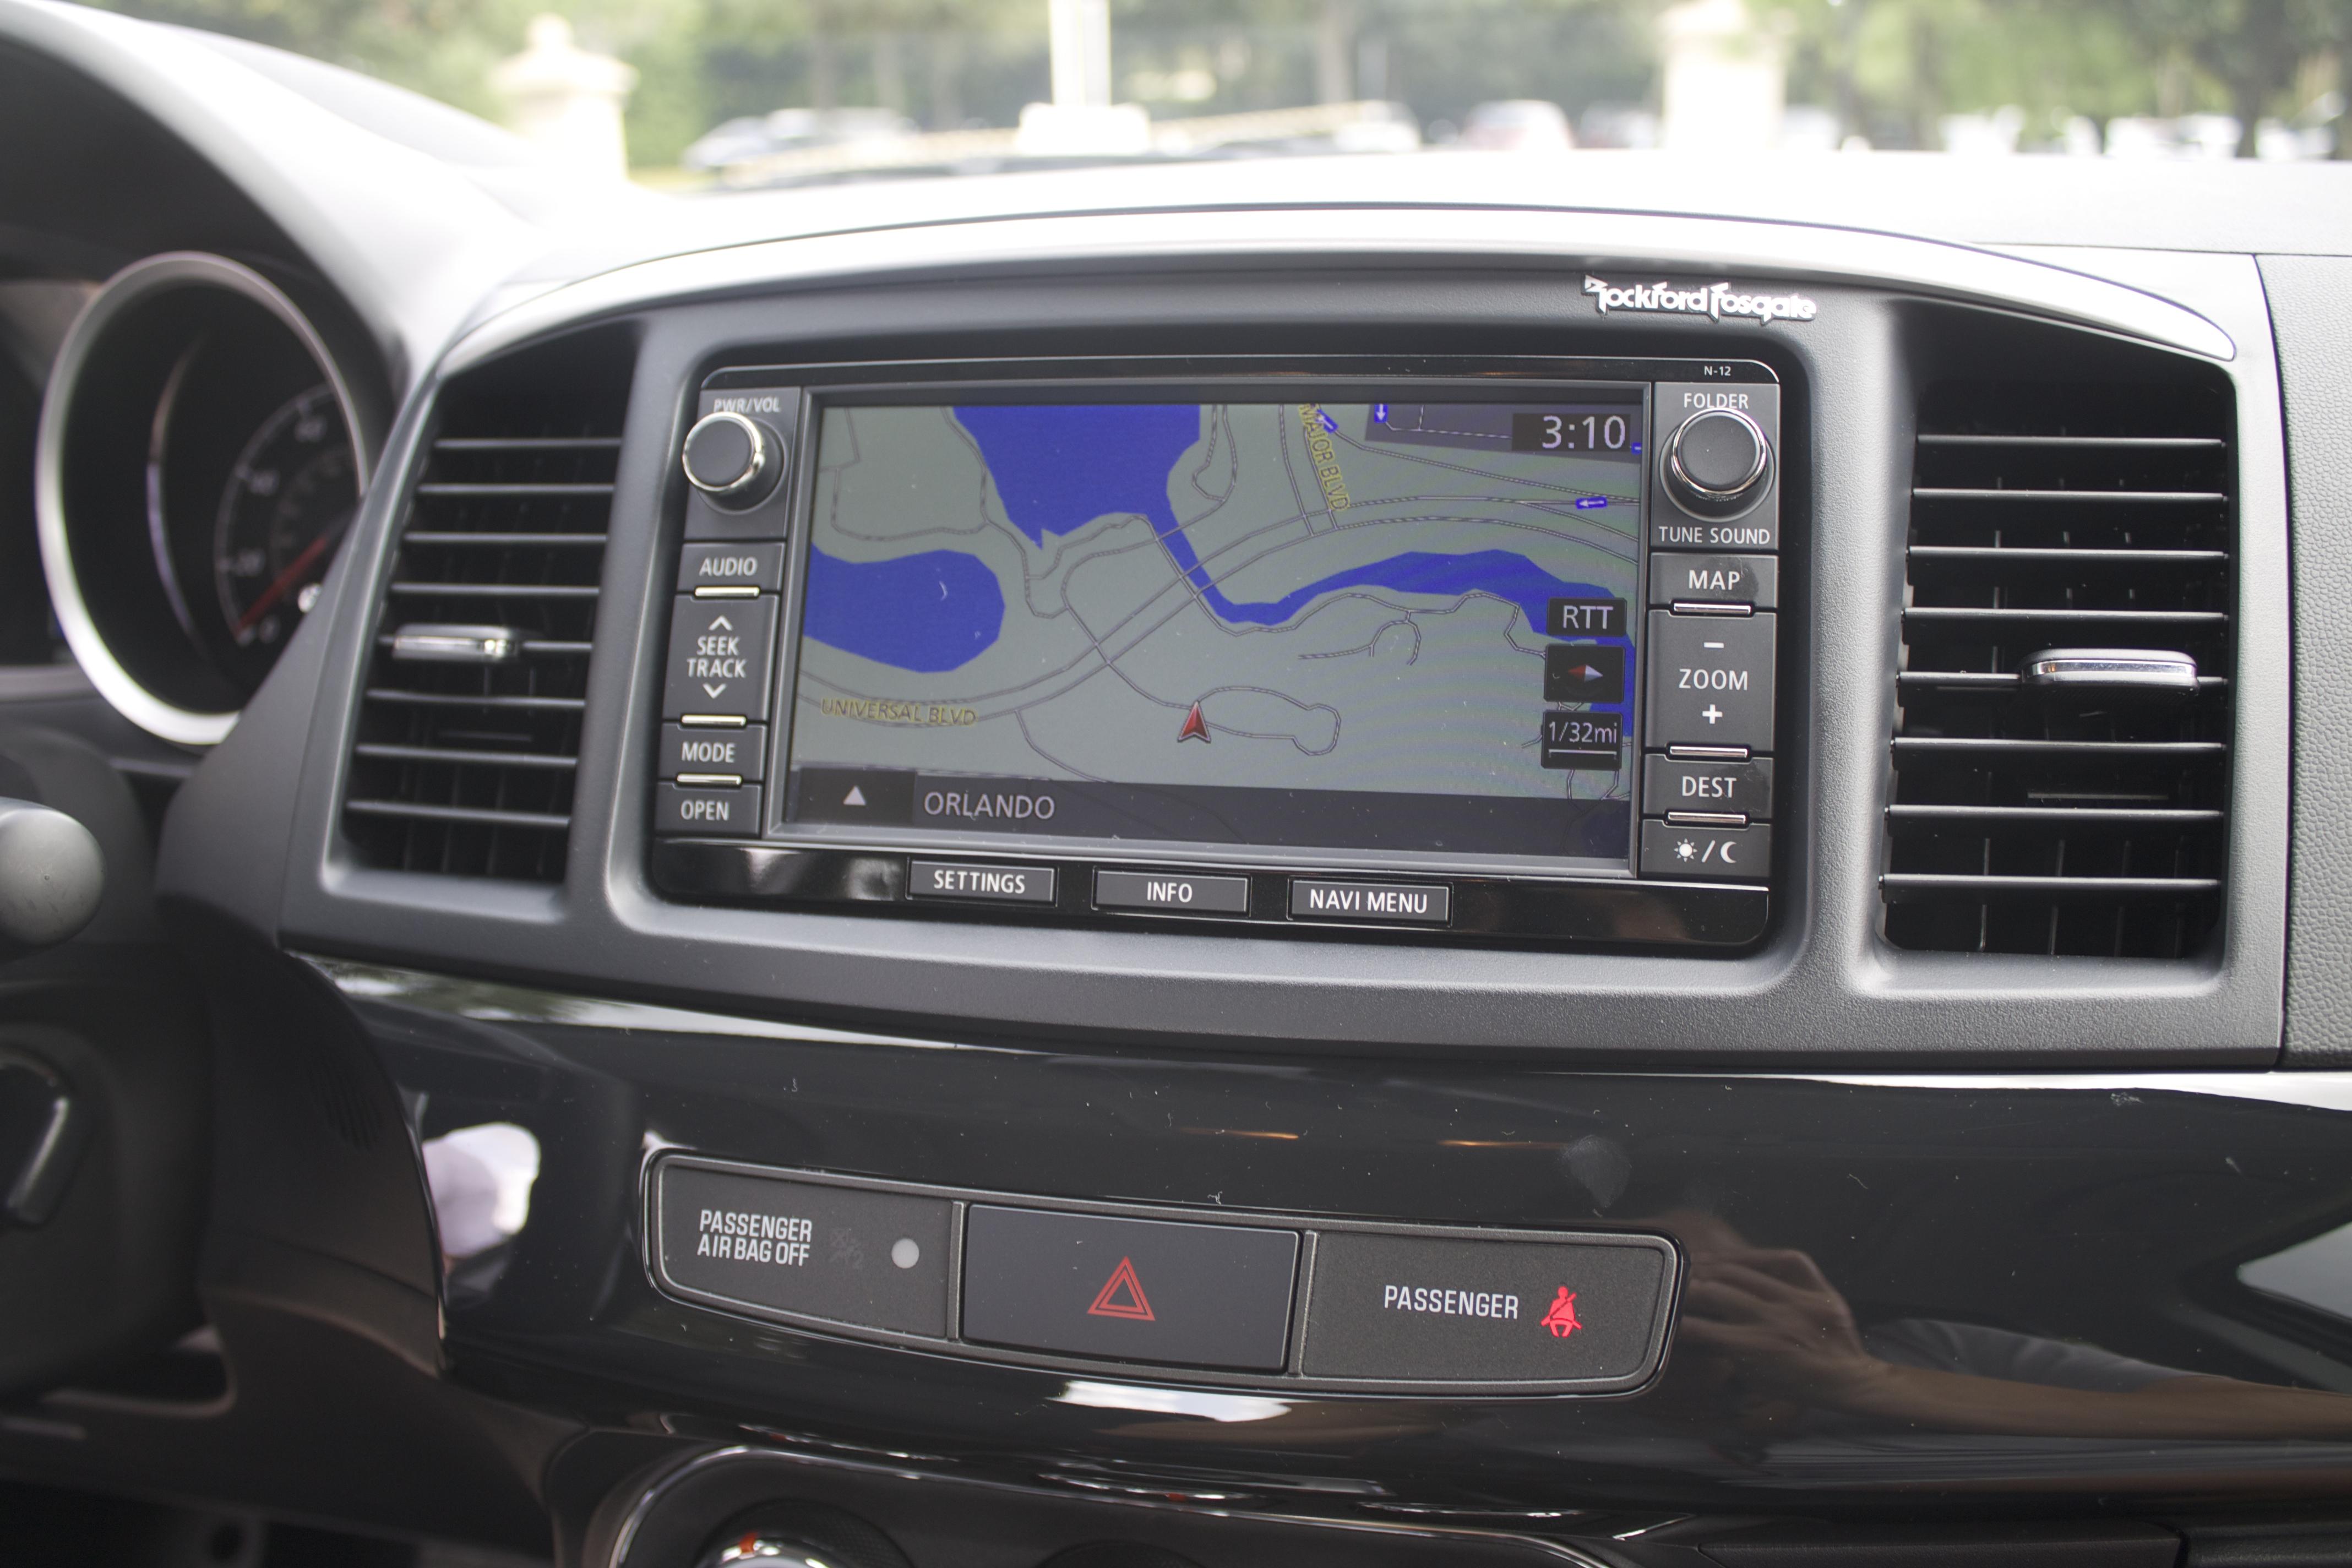 2015 mitsubishi lancer gt vehicle review inside and out. Black Bedroom Furniture Sets. Home Design Ideas